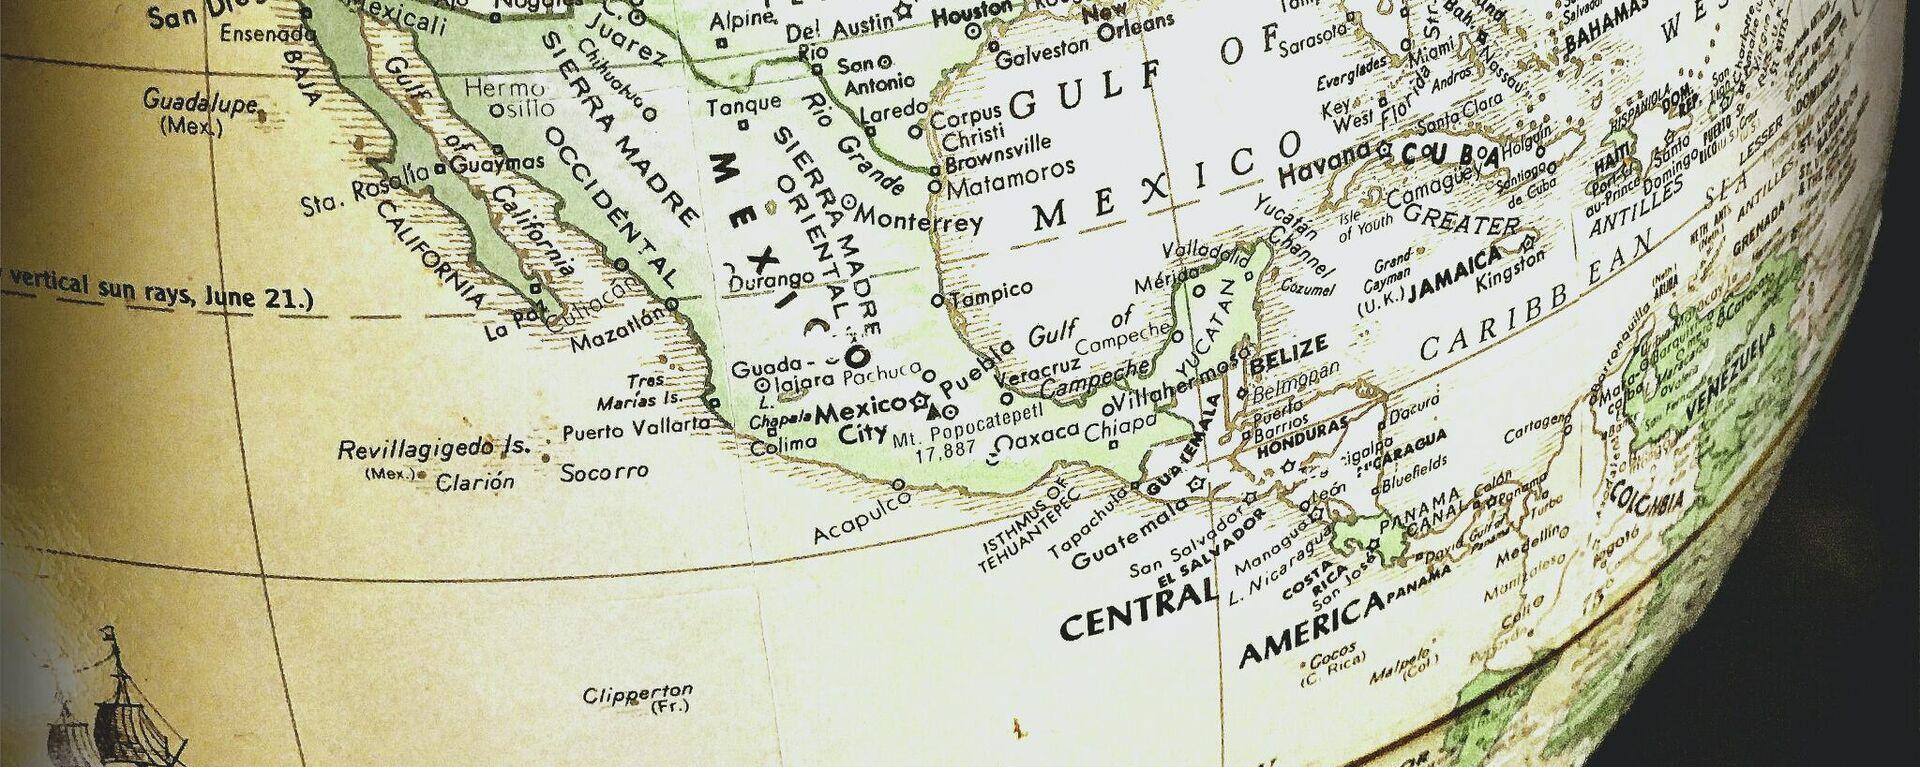 Mapa de Centroamérica - Sputnik Mundo, 1920, 29.07.2021